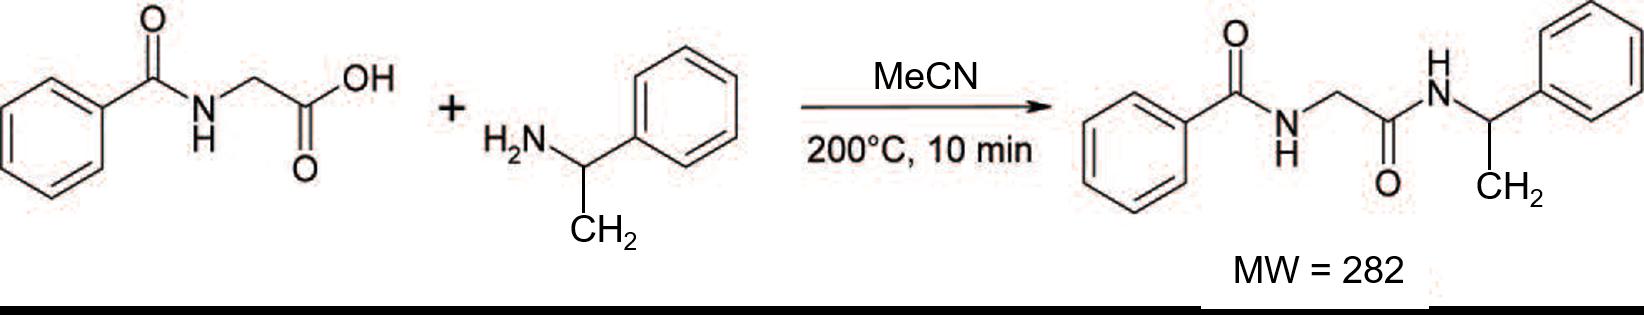 Hipp acid + aMBA RxN in ACN